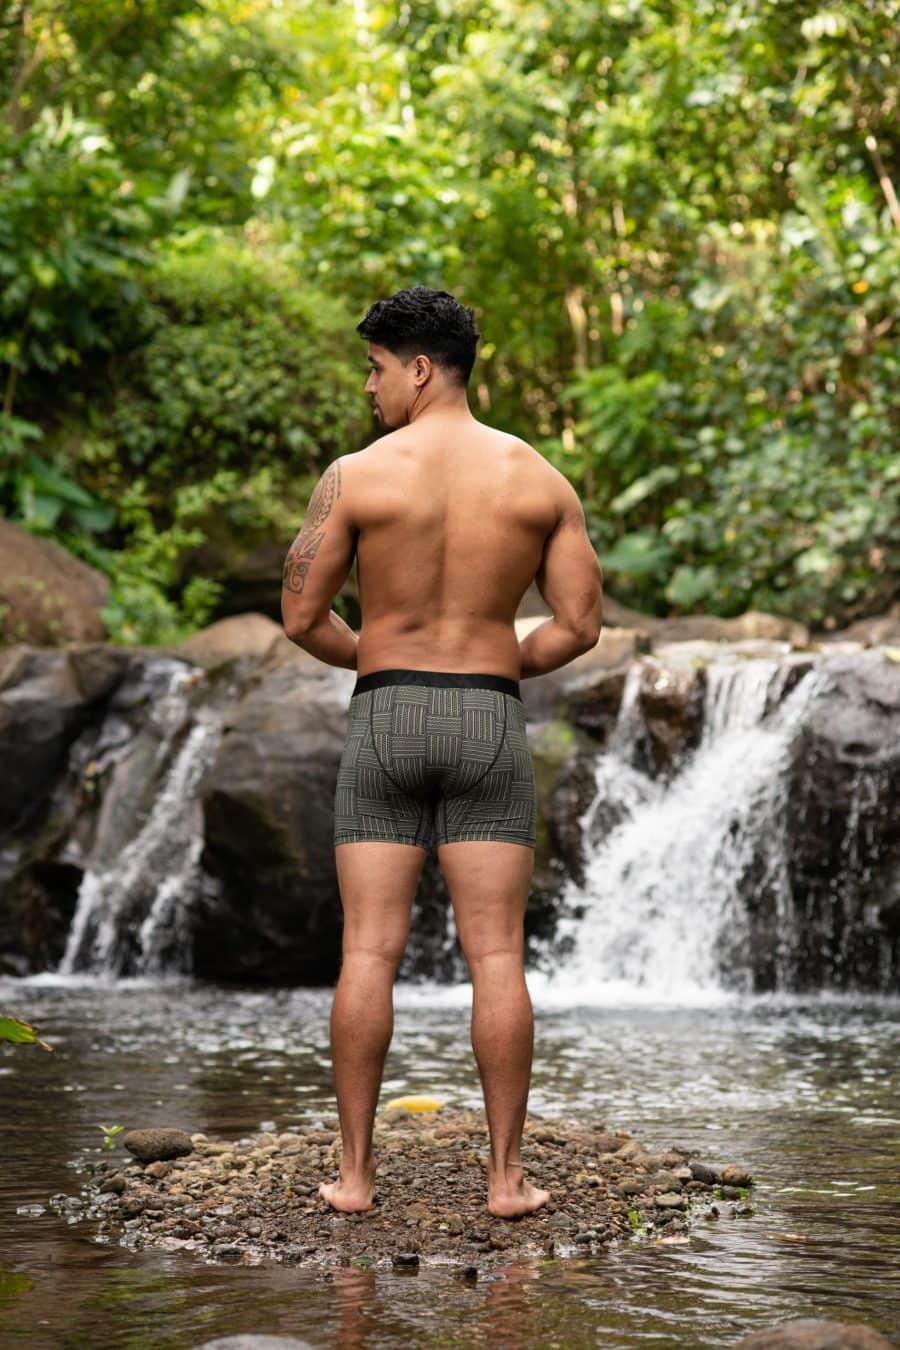 Male model wearing Manaola Boxer Trunk in Martini Olive-Jet Black Ulana Pattern - Back View